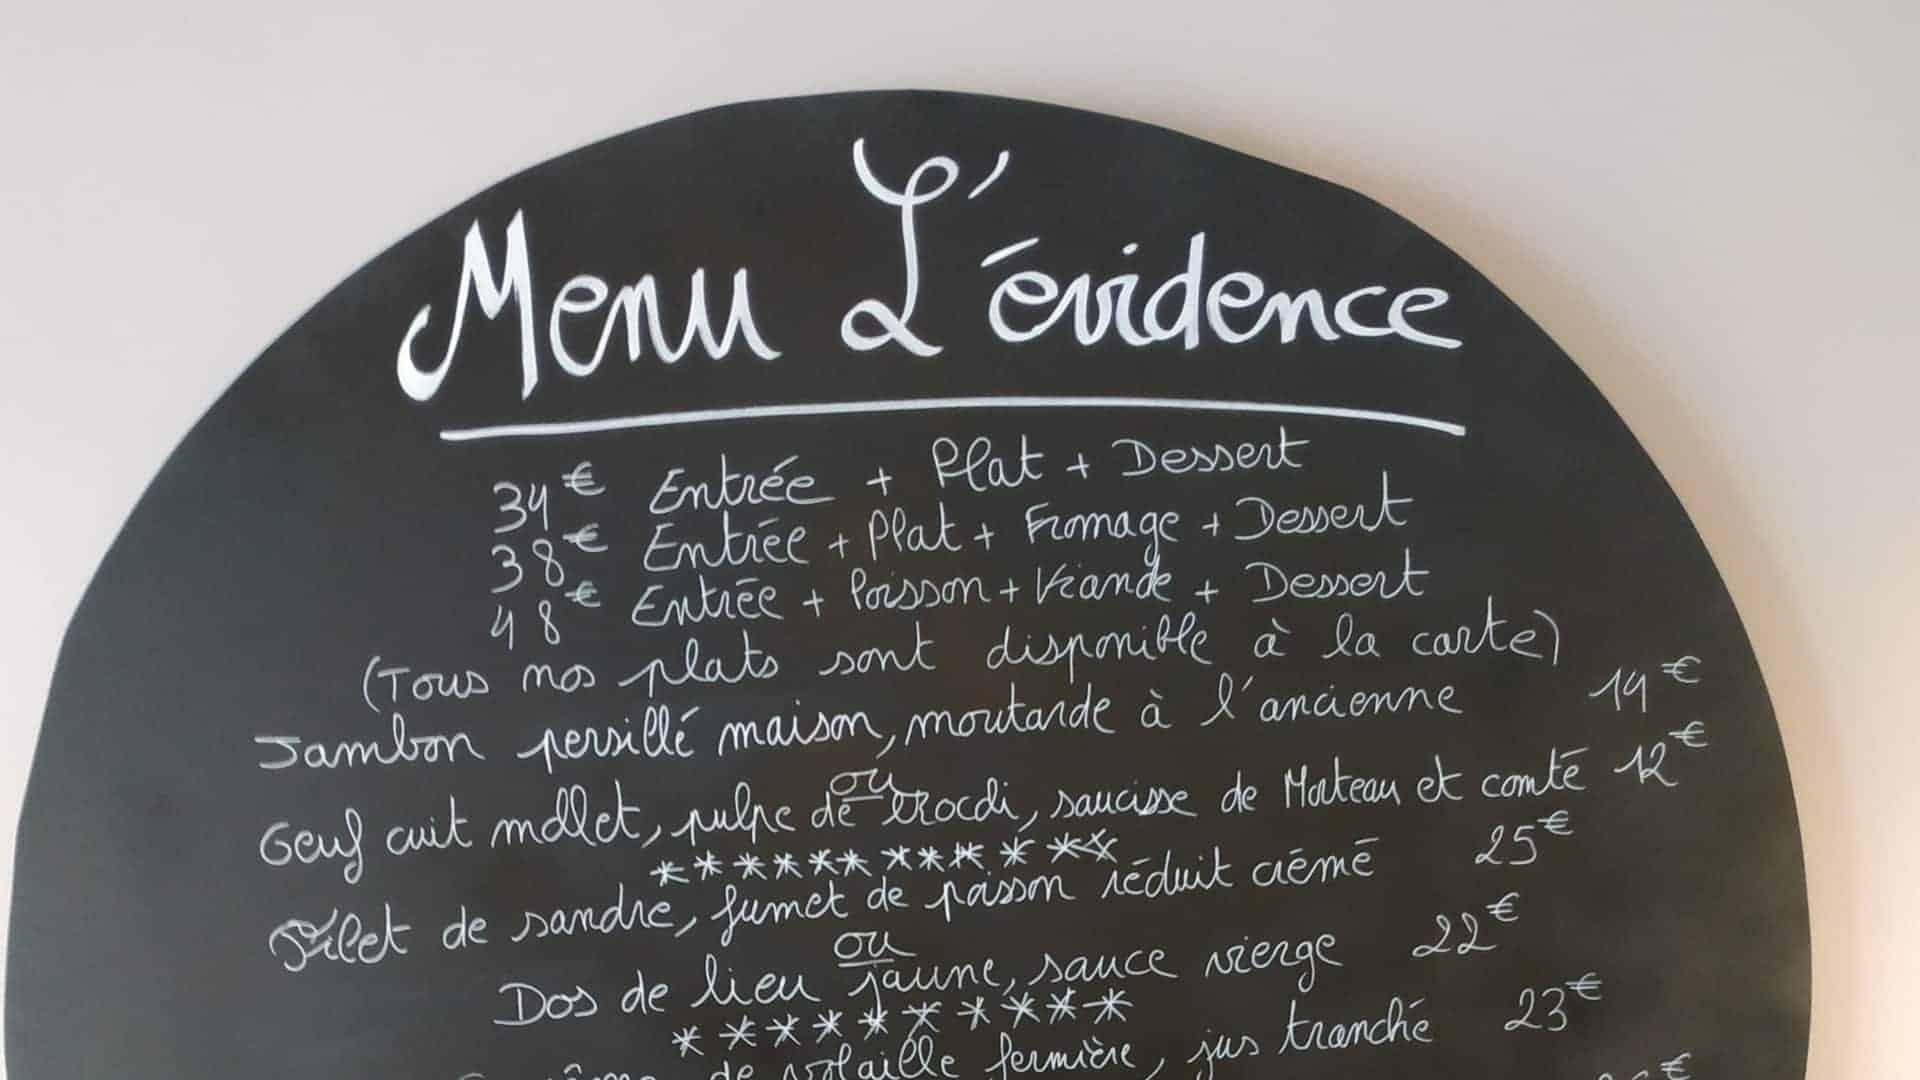 l'évidence-menu-salle